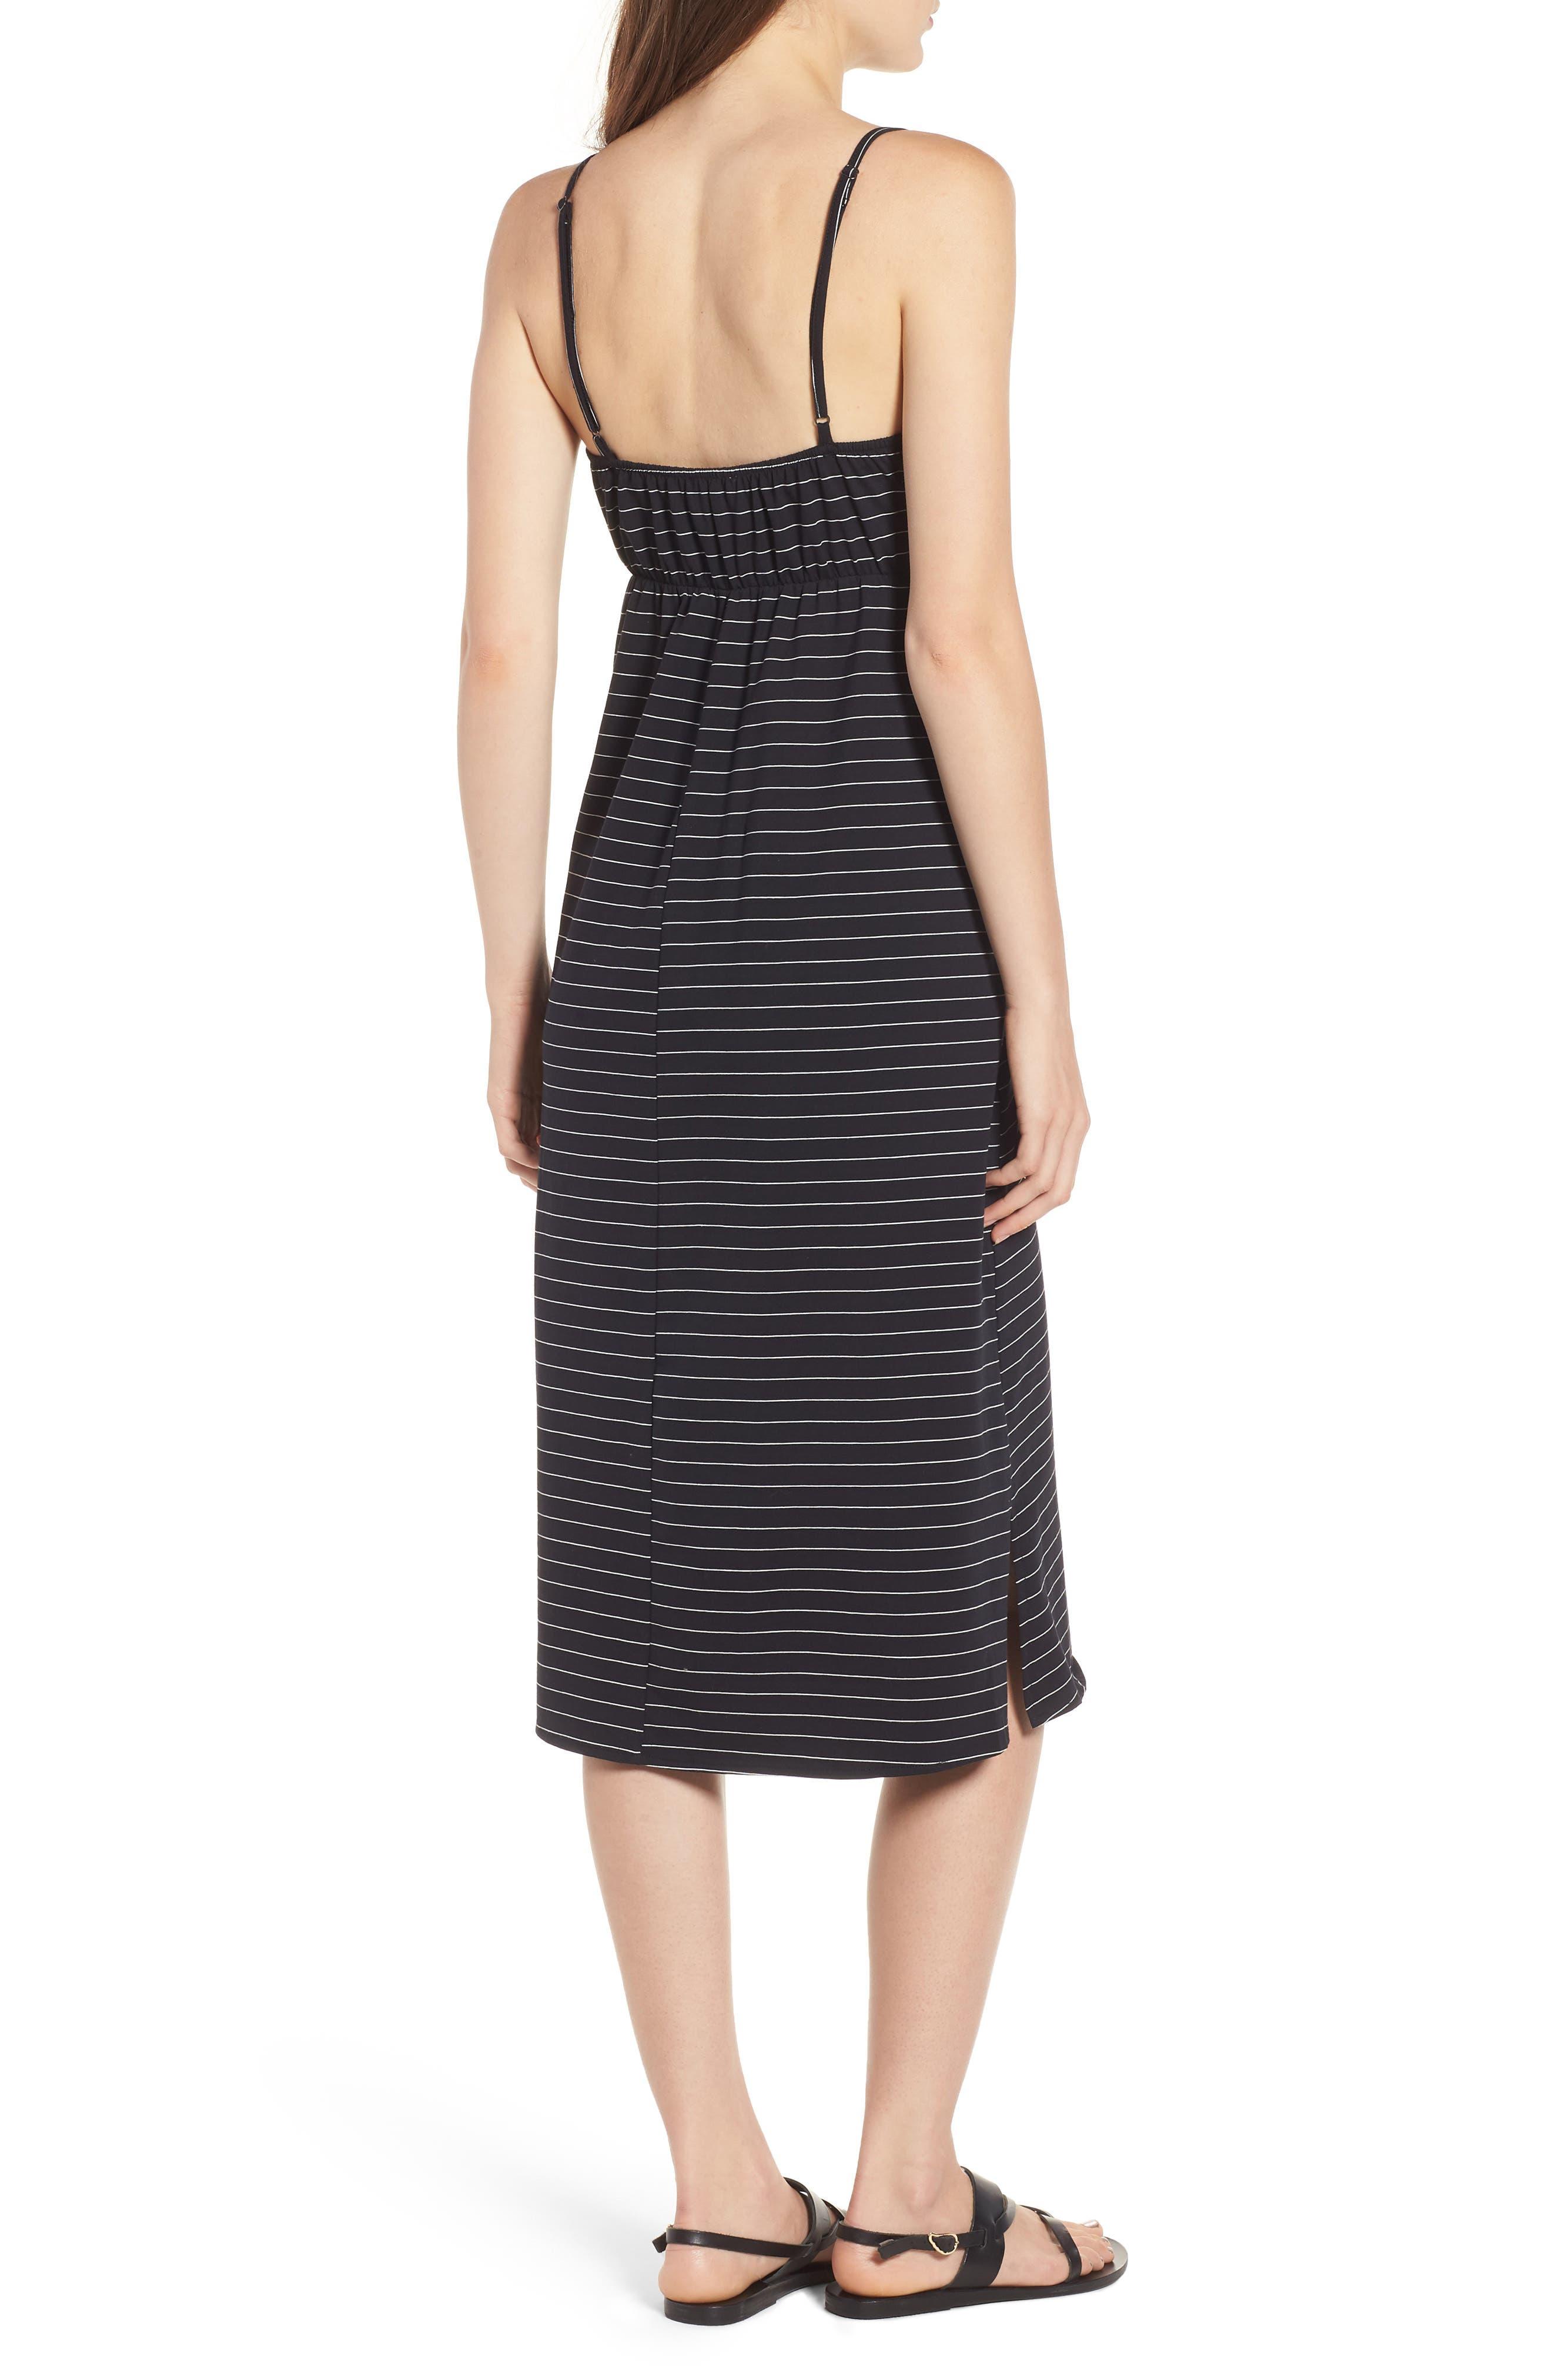 Suzanne Knot Front Dress,                             Alternate thumbnail 3, color,                             Black